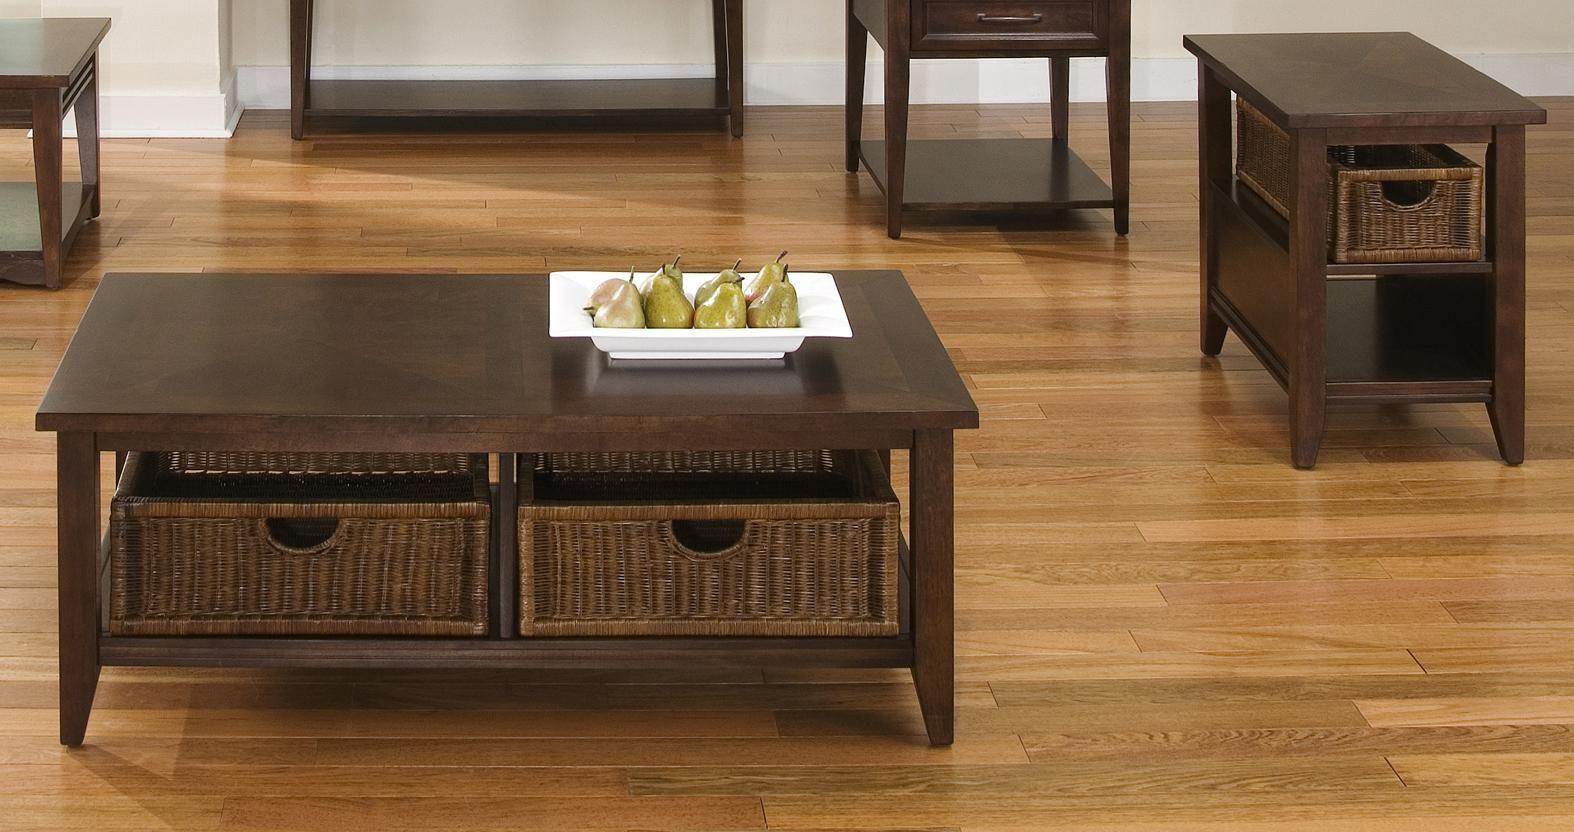 Best Unique Coffee Table Styling Ideas Unique Coffee Table - Coffee and end table sets with storage